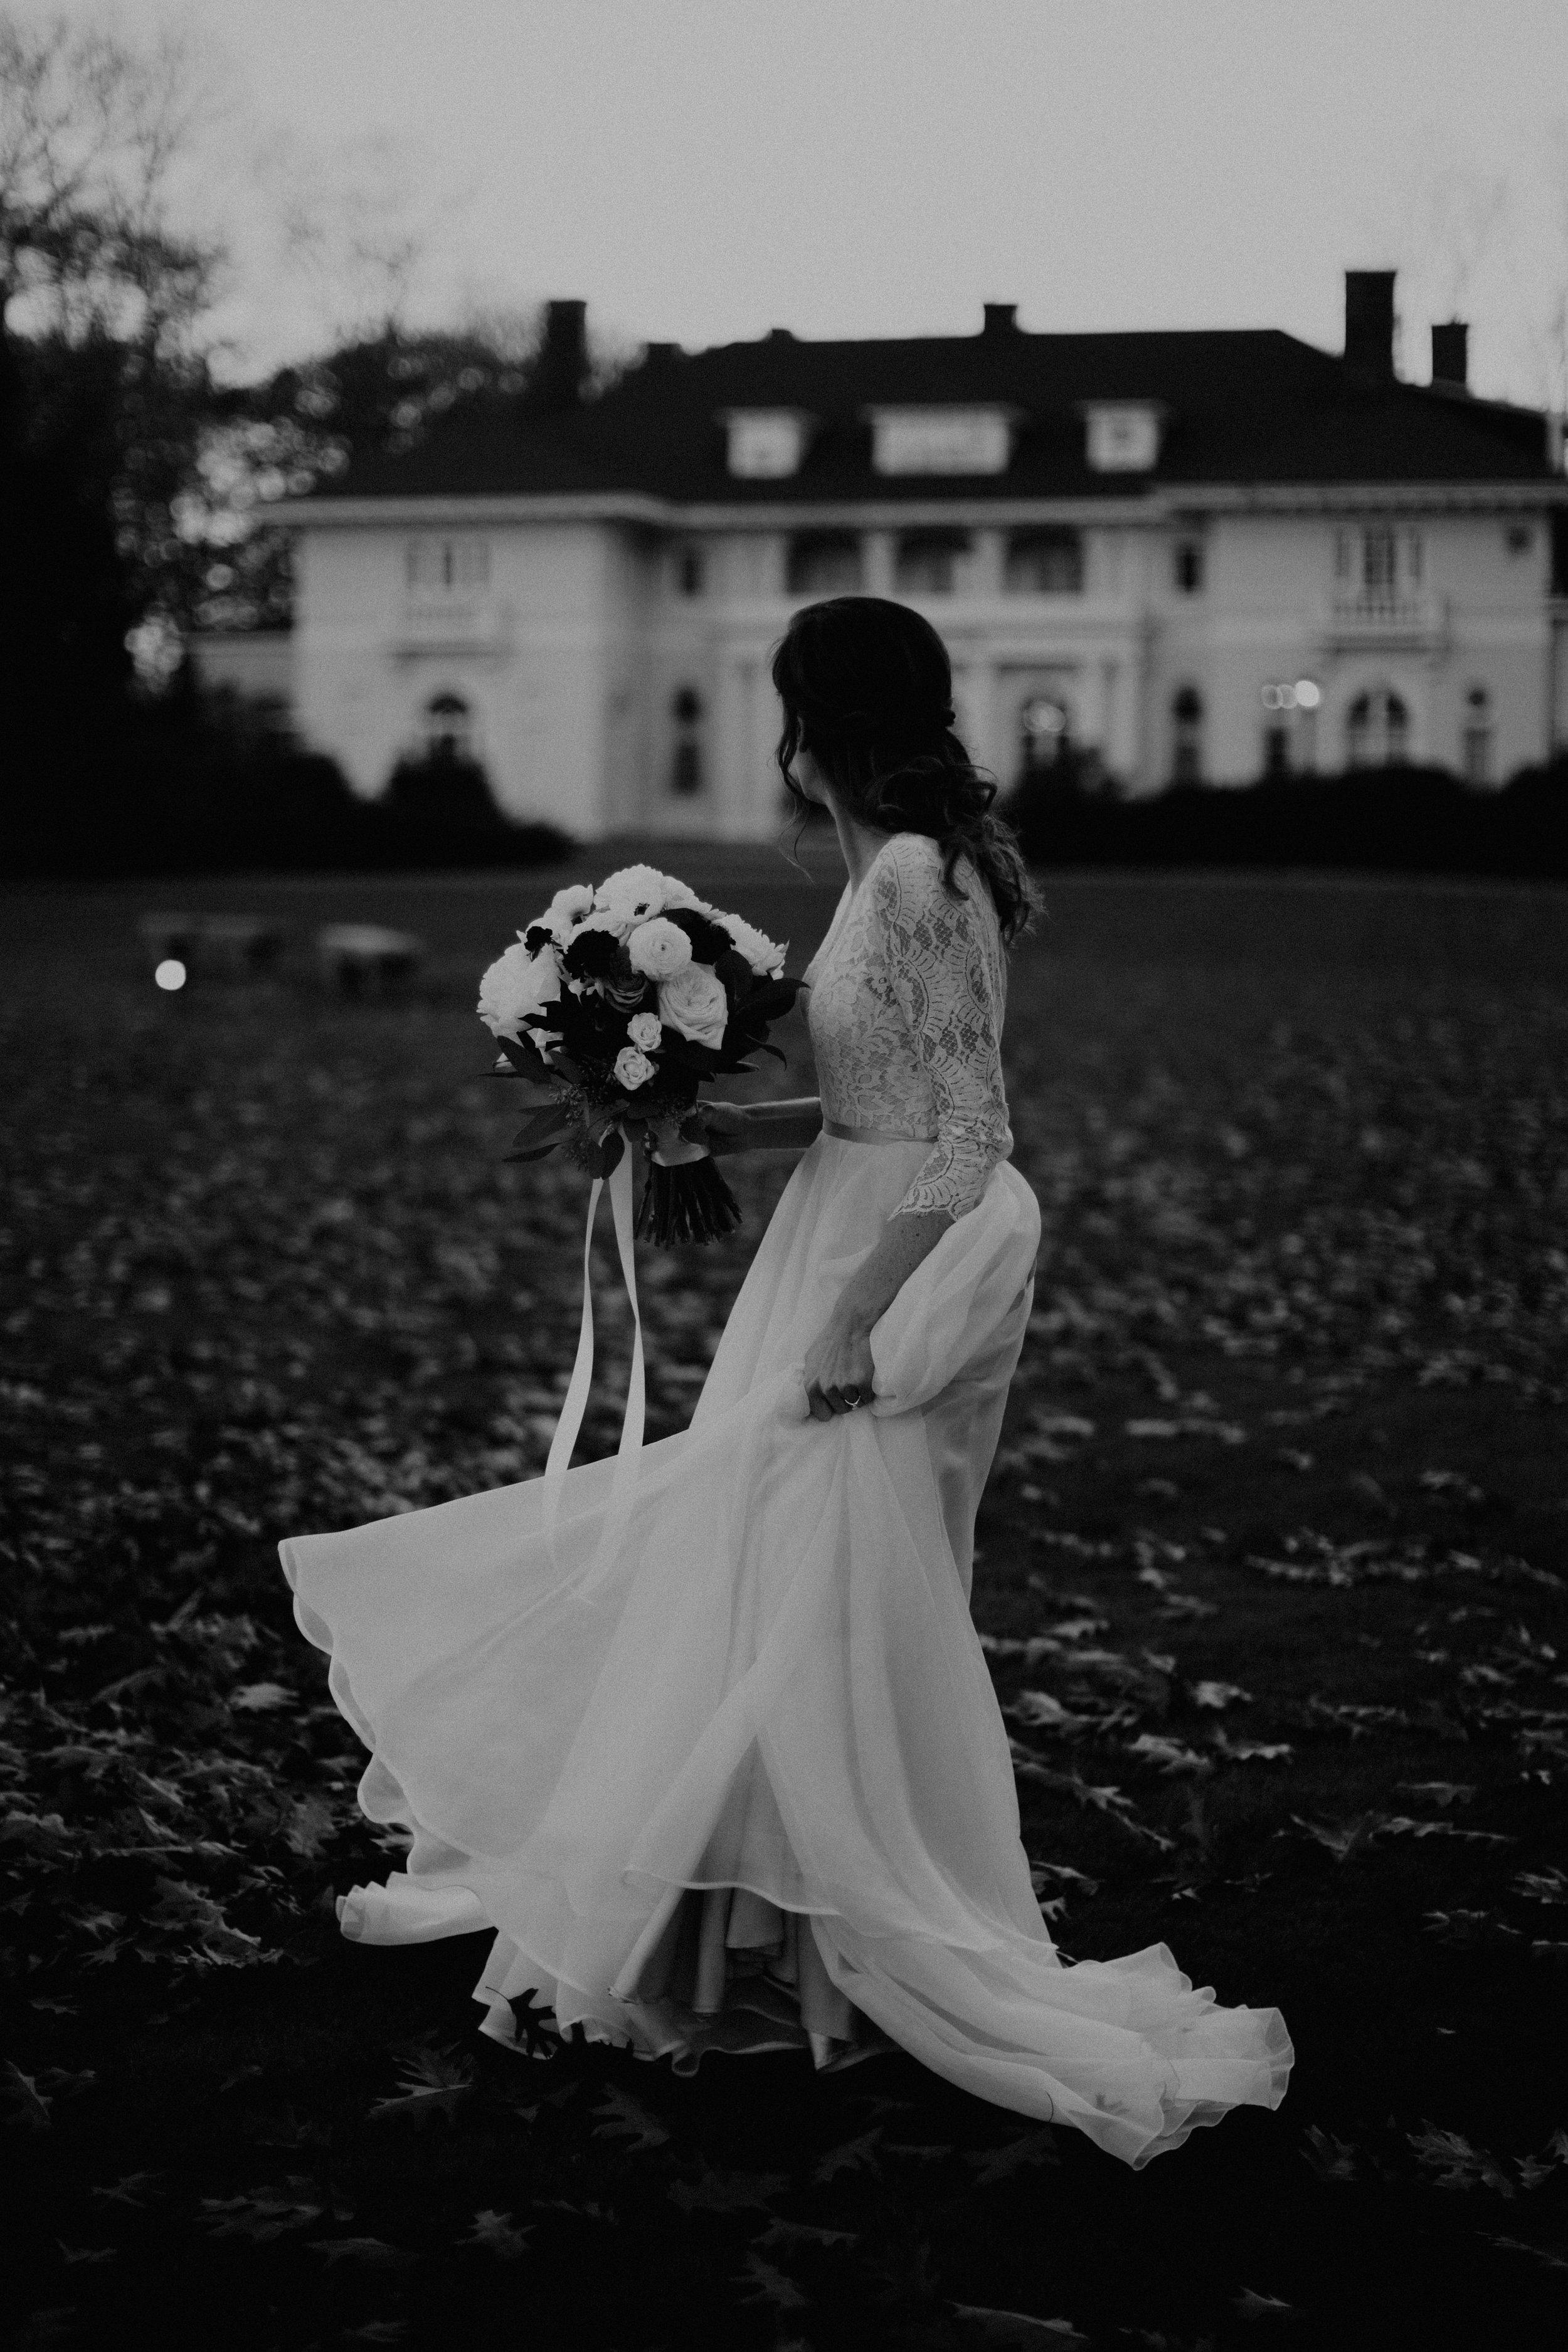 beverly_ma_wedding-34.jpg